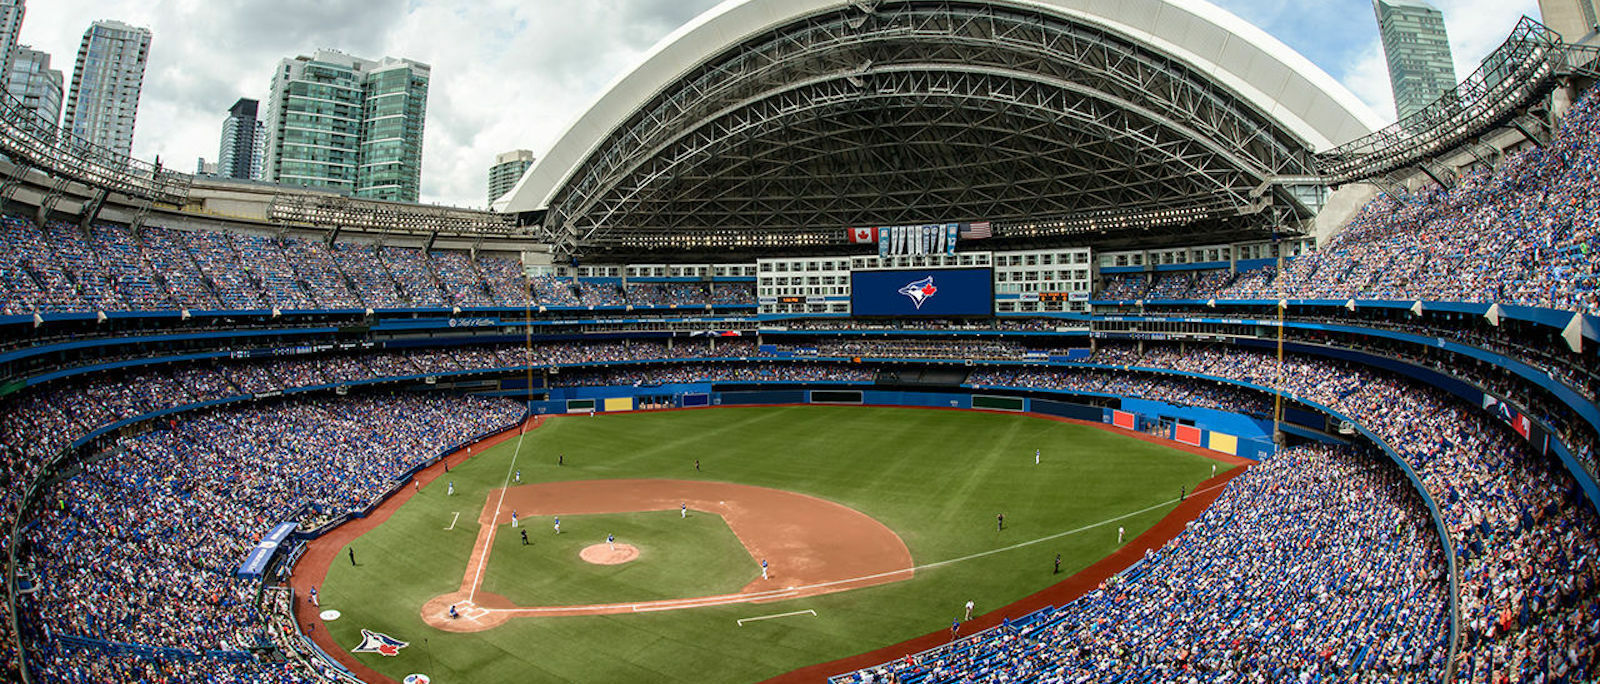 Toronto Blue Jays Road Games